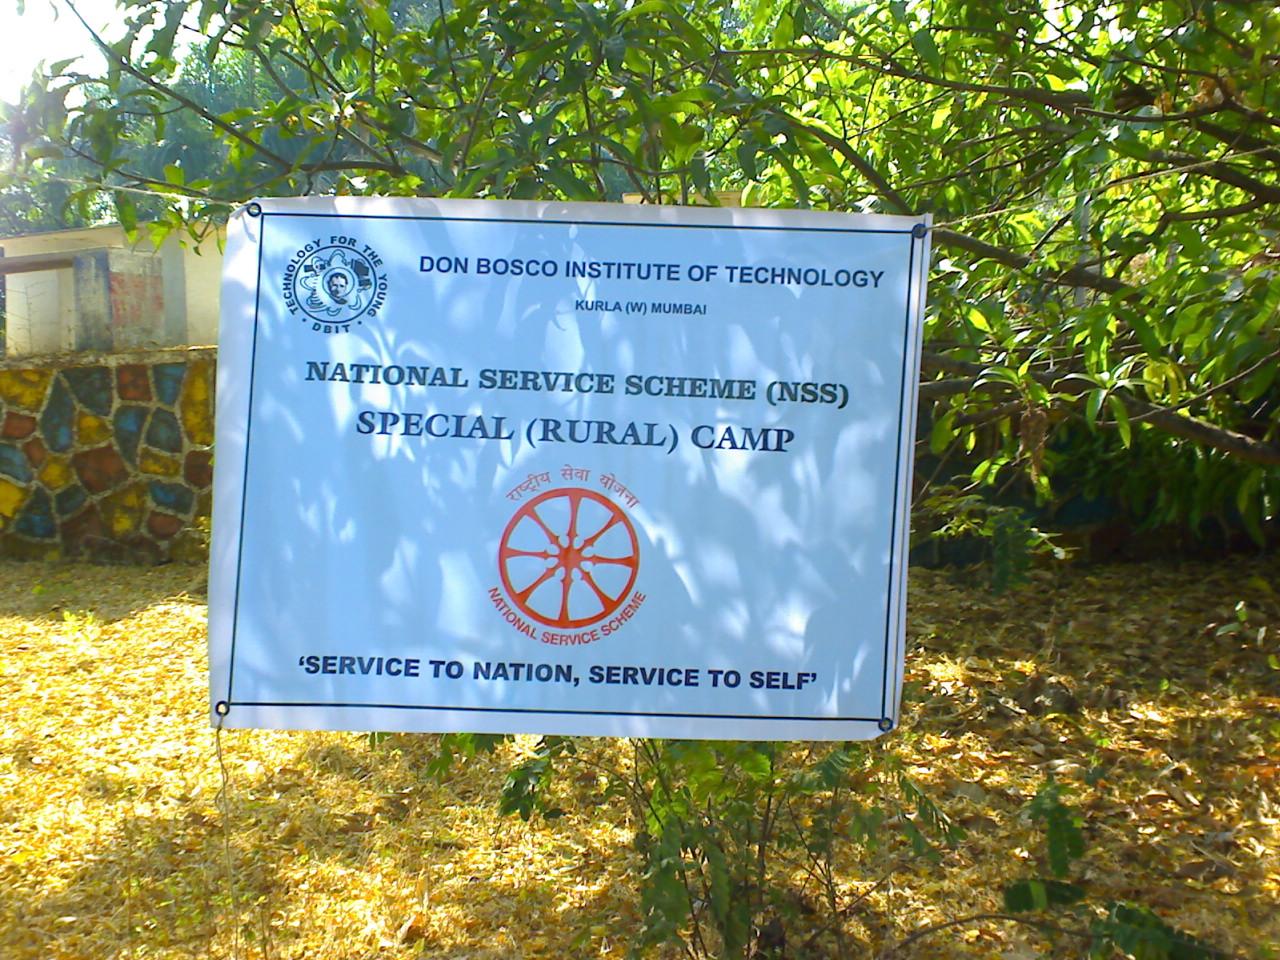 Special Camping Program